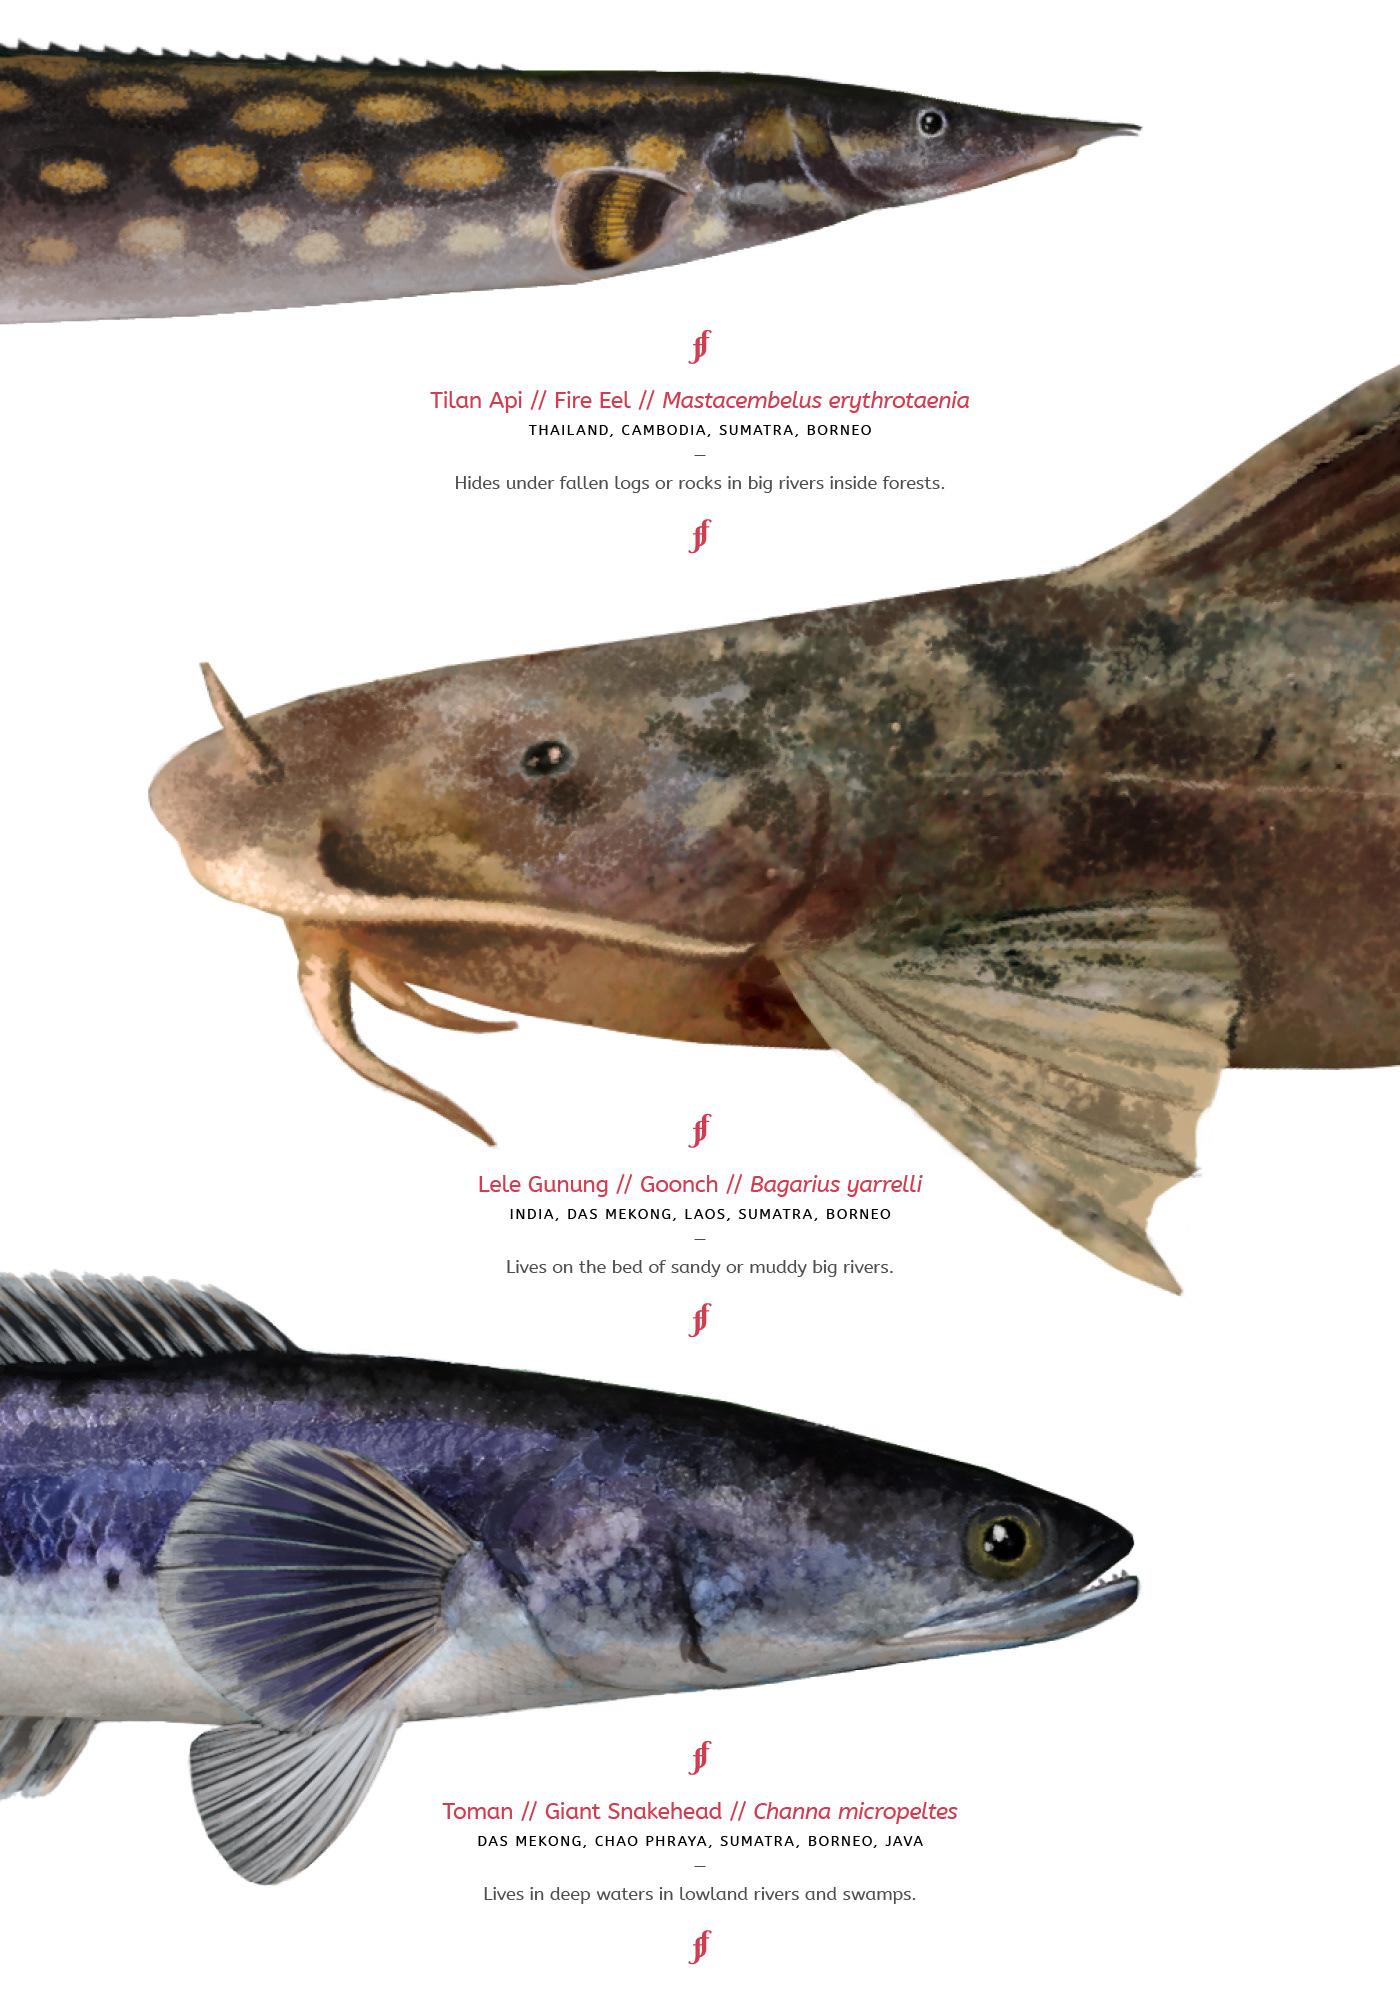 fish animal science biology creature scientific illustration Nature wildlife indonesia Tropical